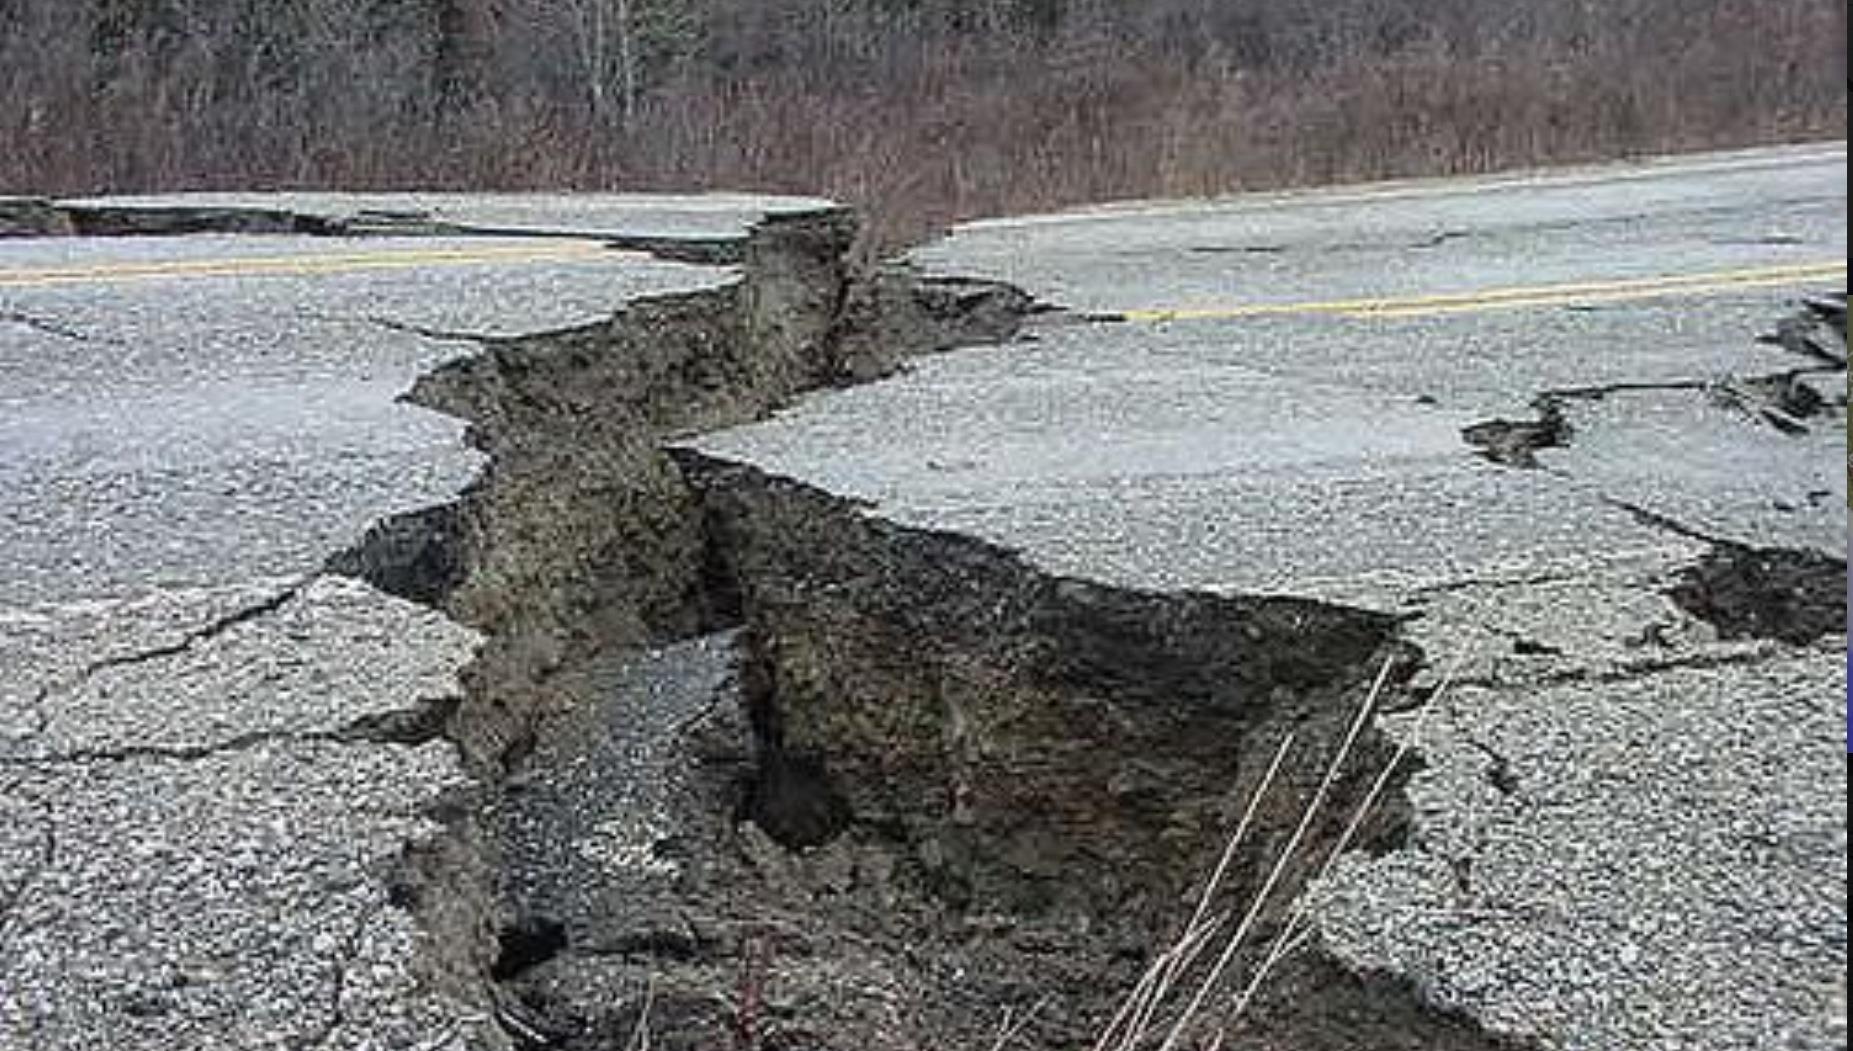 ansia danni disastri naturali